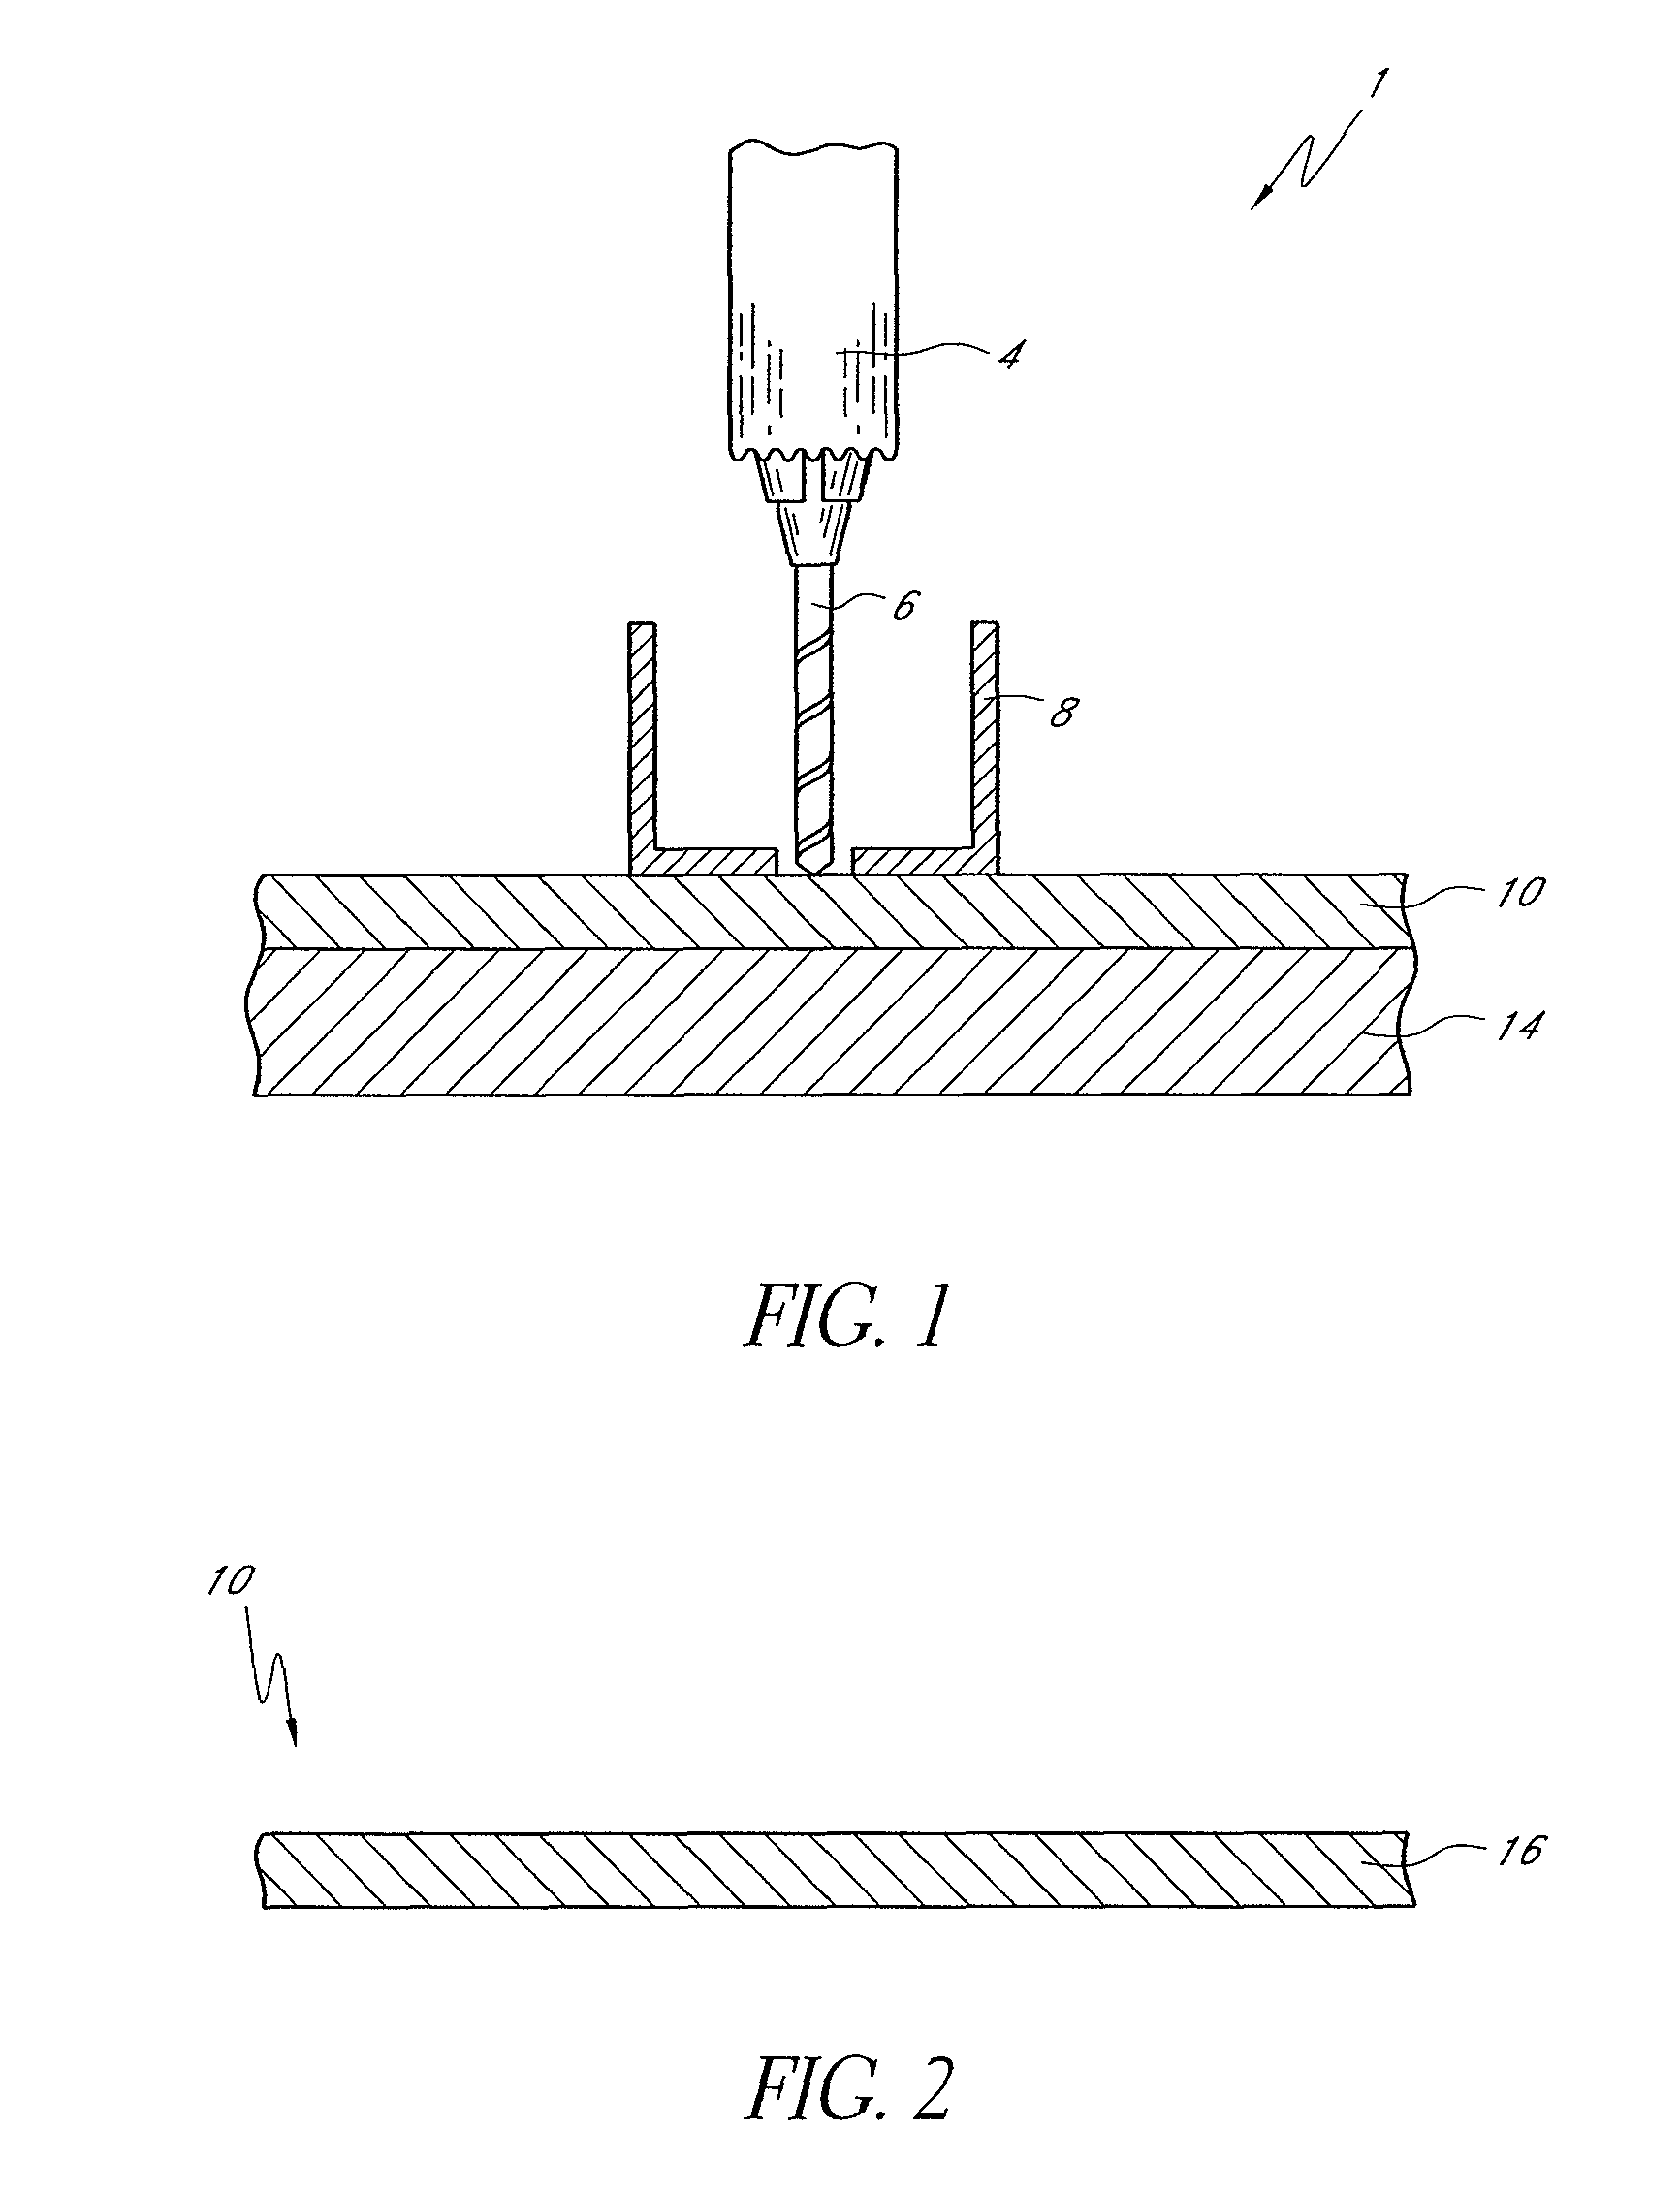 circuit board drilling holes